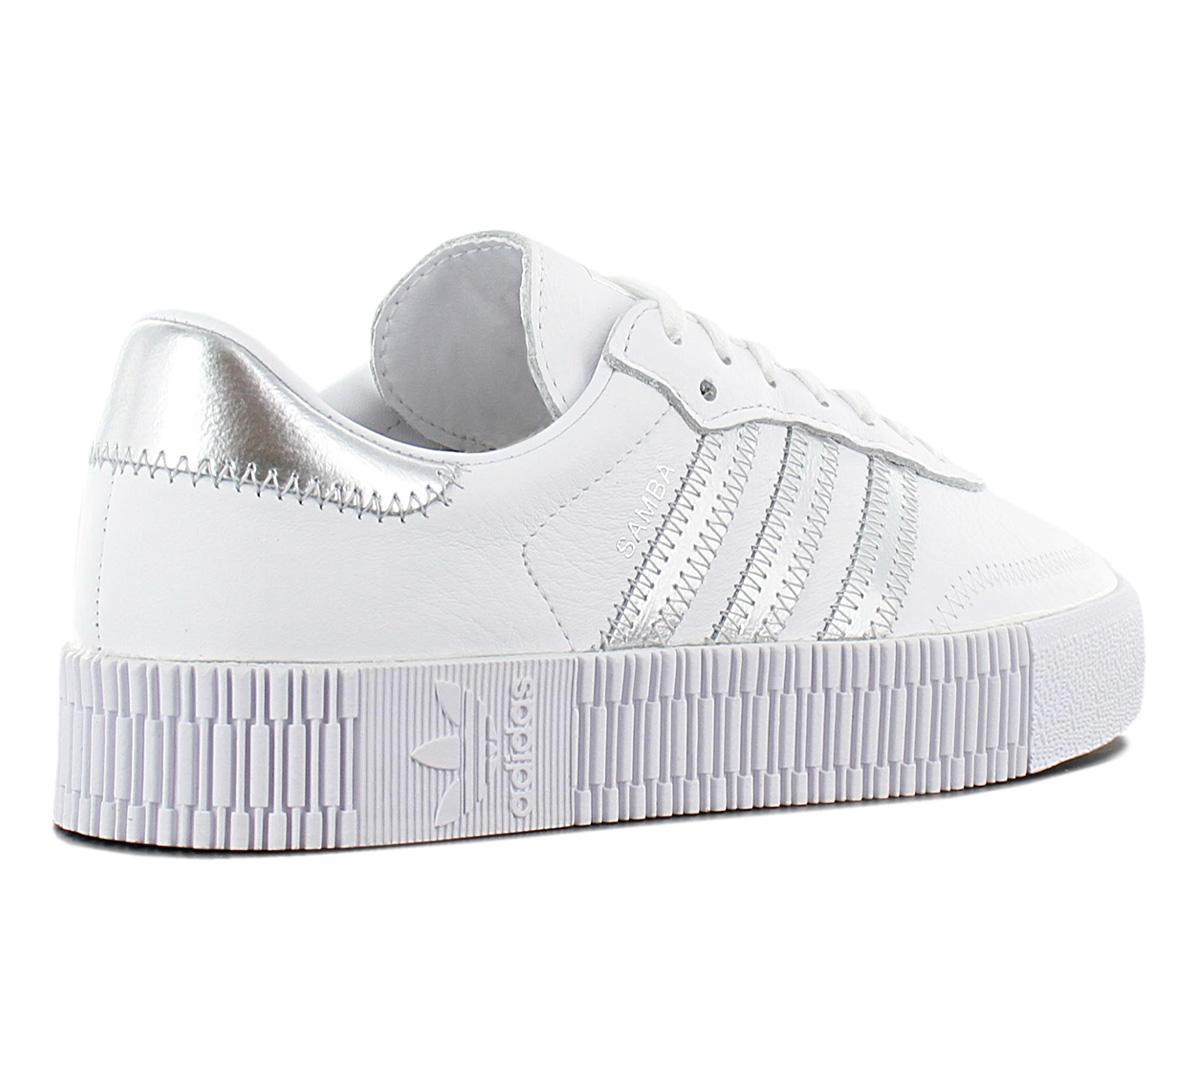 Details zu adidas Originals Sambarose W Damen Sneaker EE9017 Weiß Leder Schuhe Samba NEU